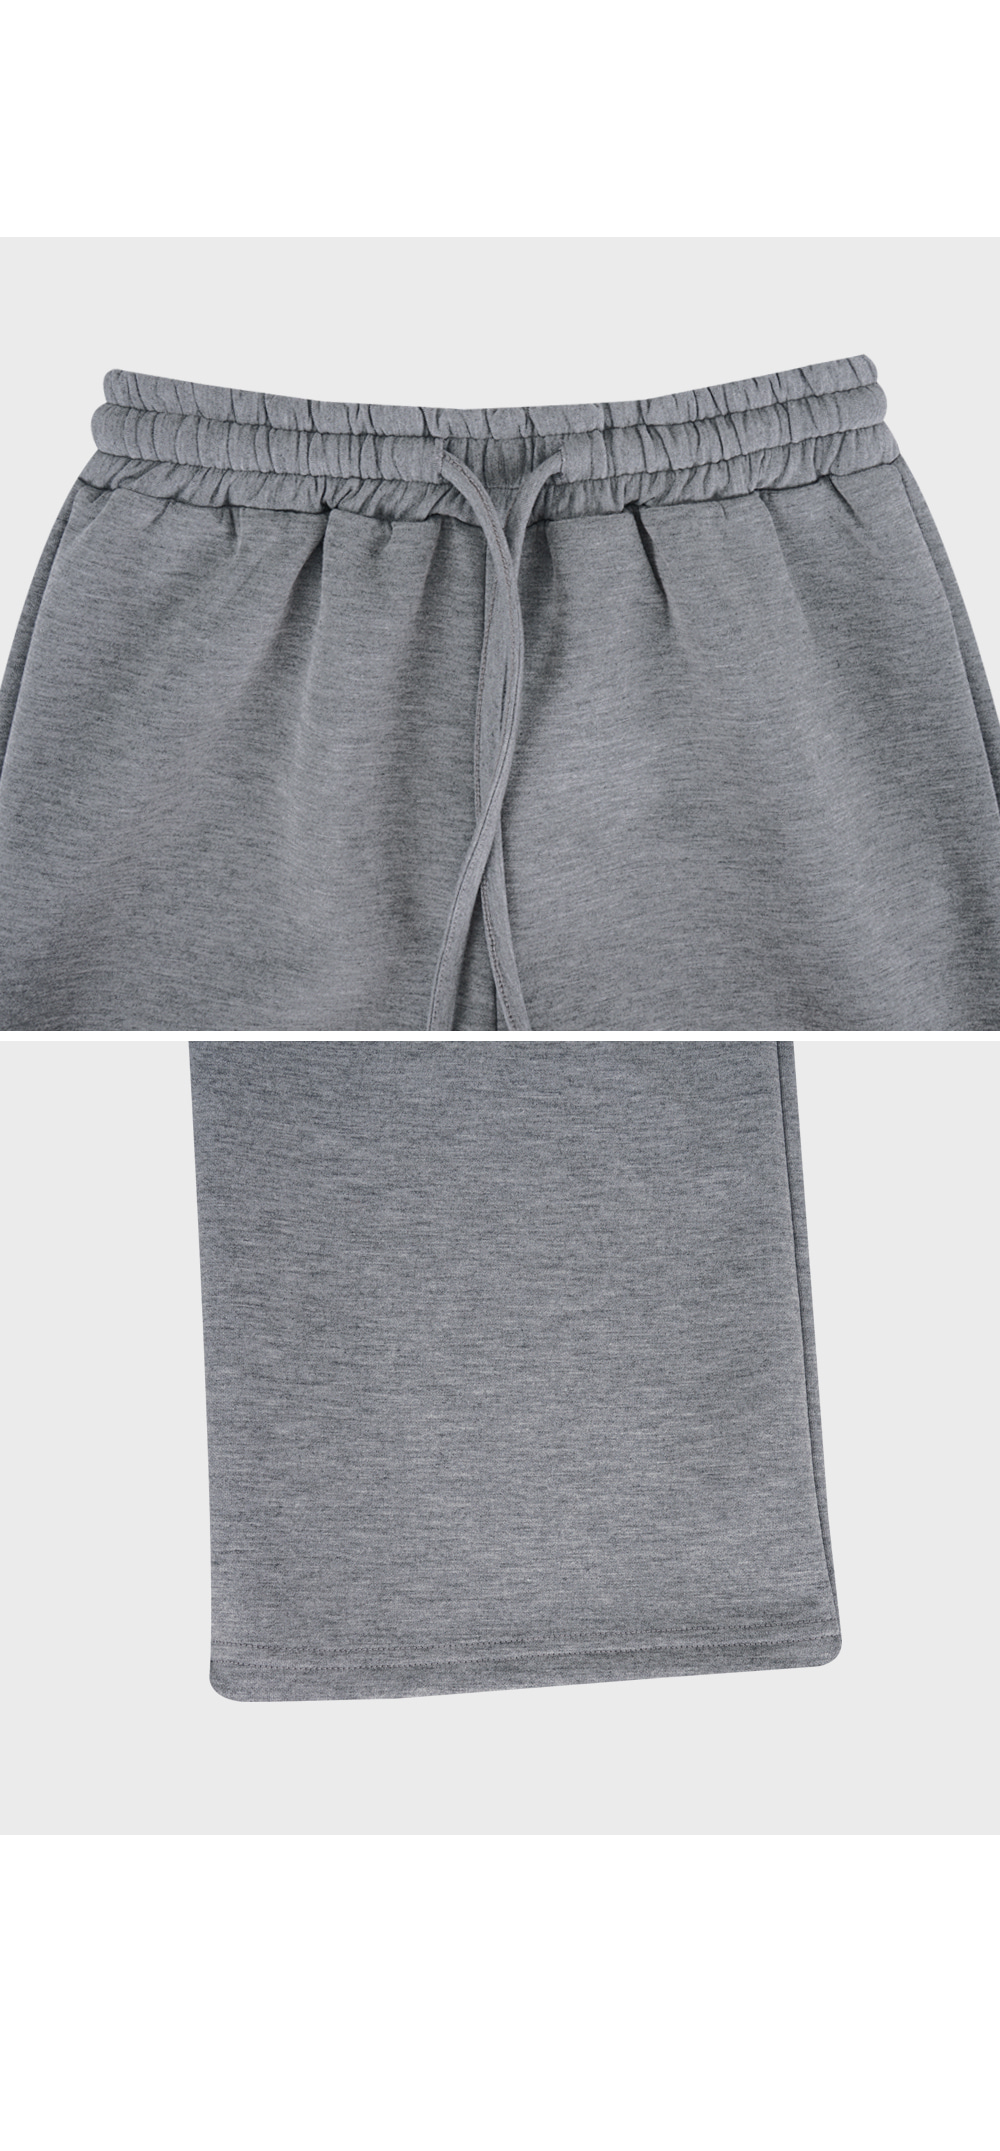 Casual Soft Training Pants-holiholic.com